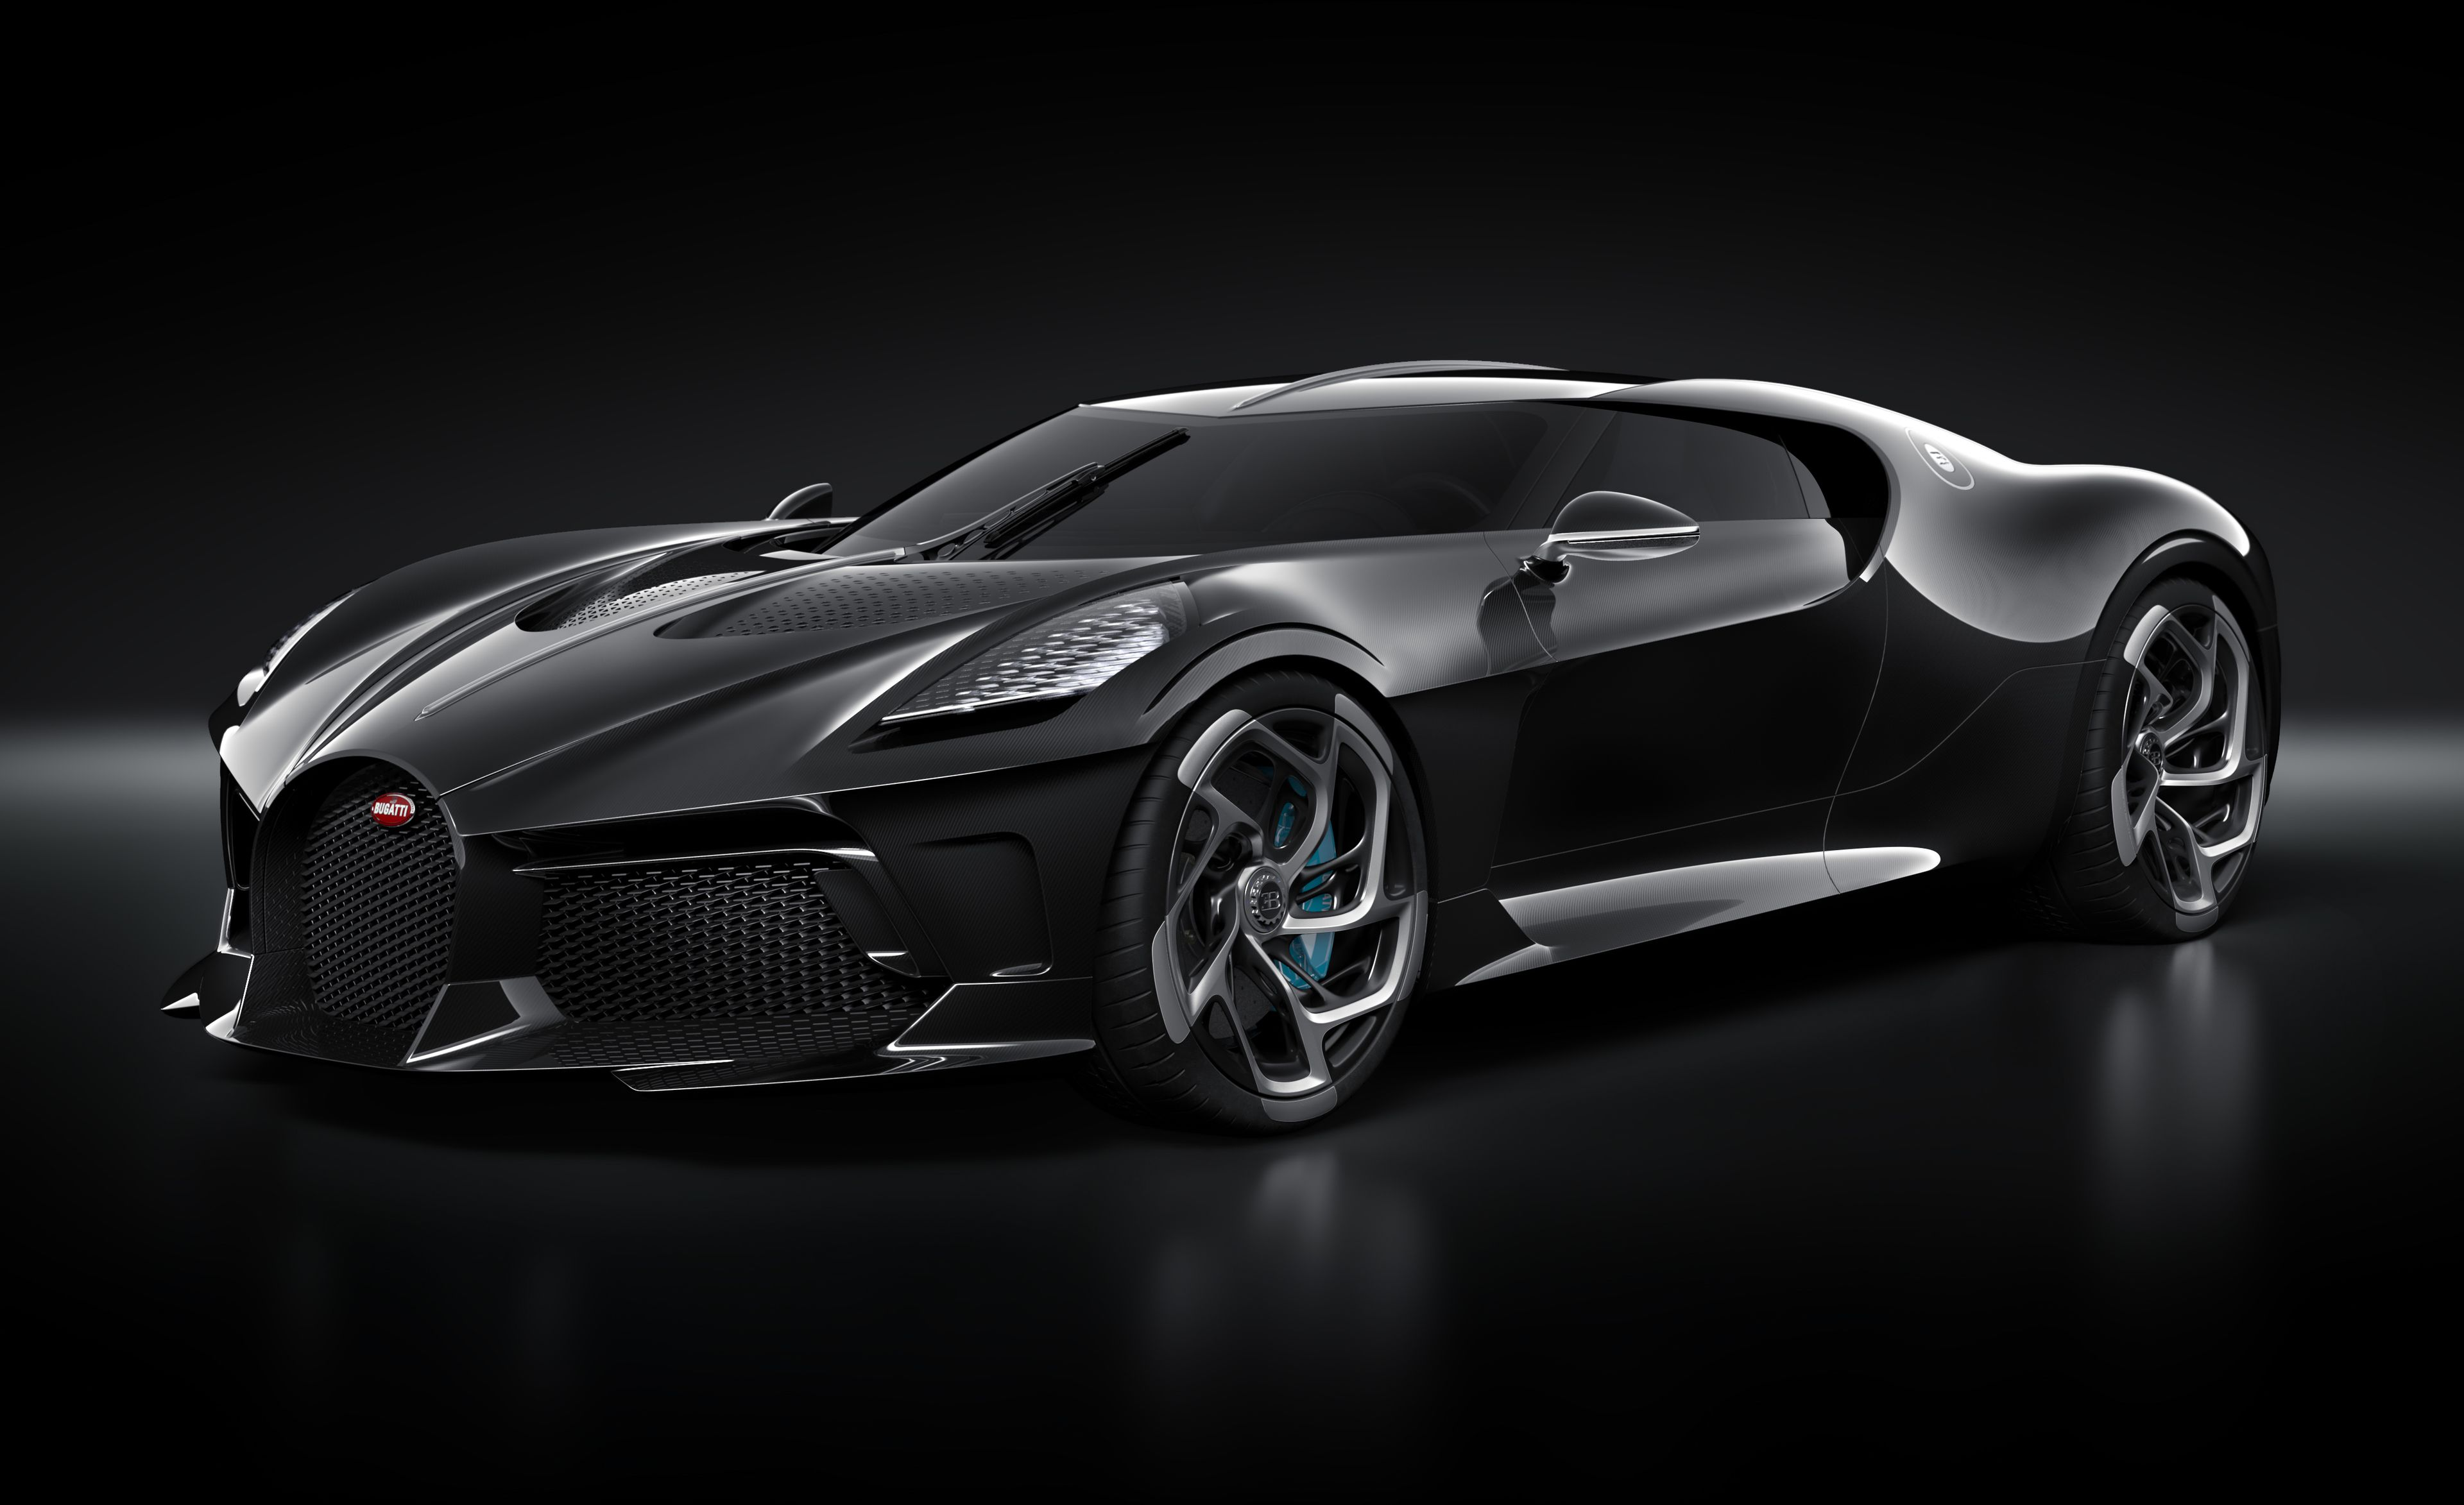 Роналдо купи единствената La Voiture Noire на Bugatti